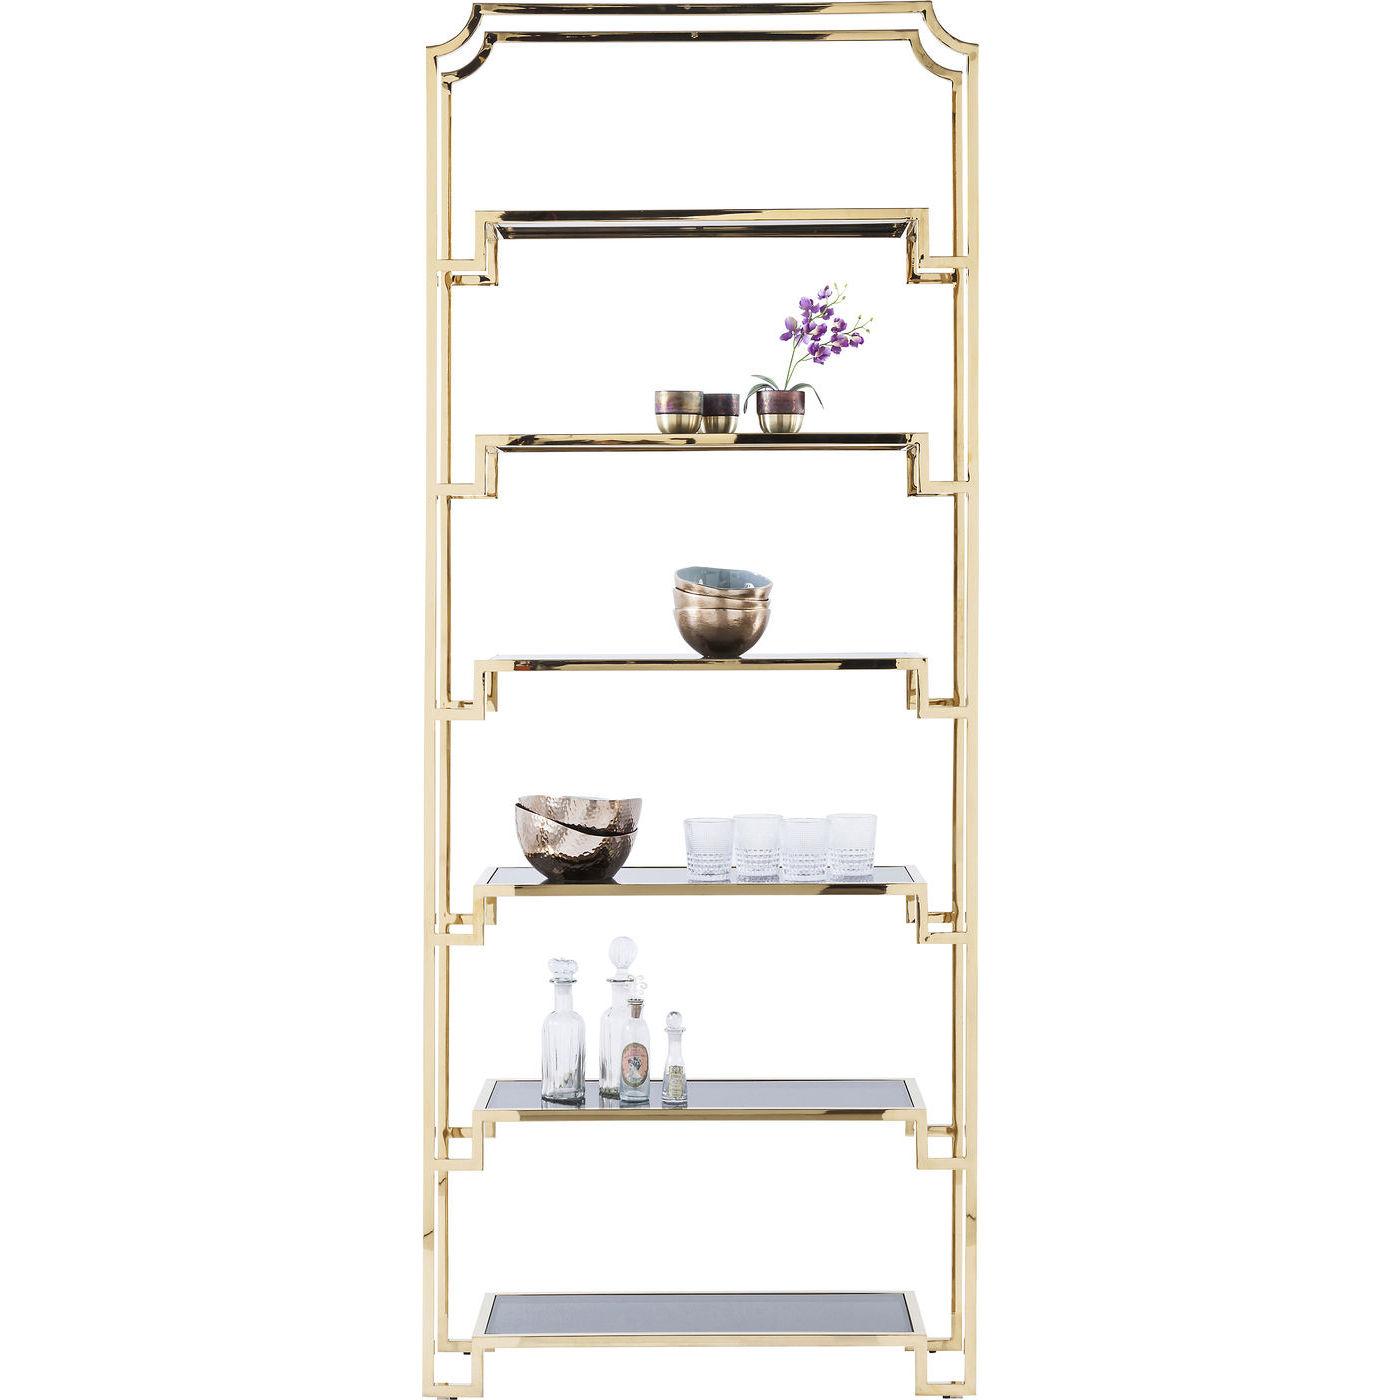 Image of   KARE DESIGN Gold Rush reol - glas/guld stål, m. 6 hylder